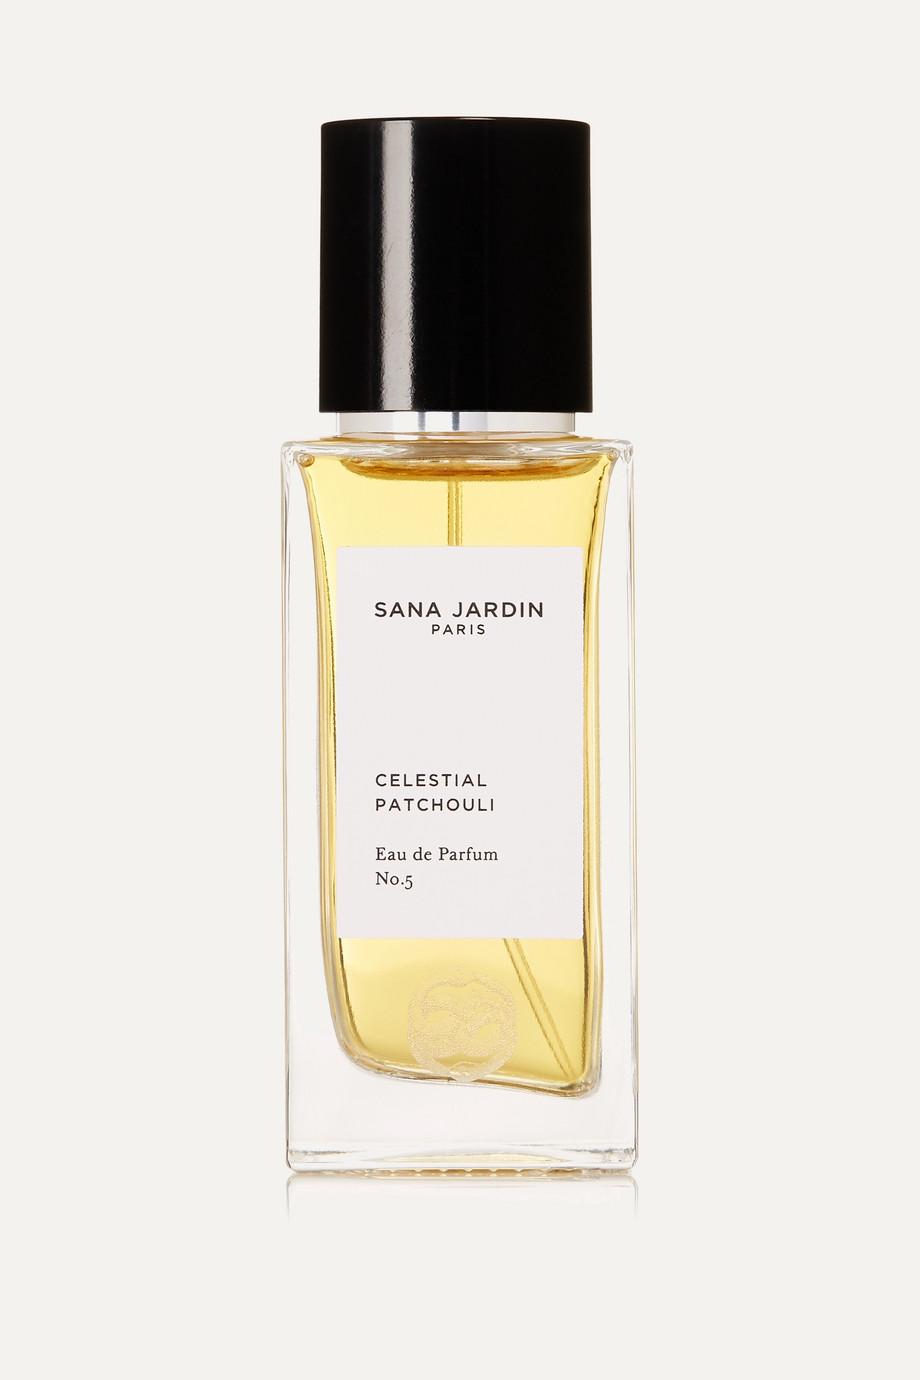 Sana Jardin + NET SUSTAIN Eau de Parfum - Celestial Patchouli, 50ml